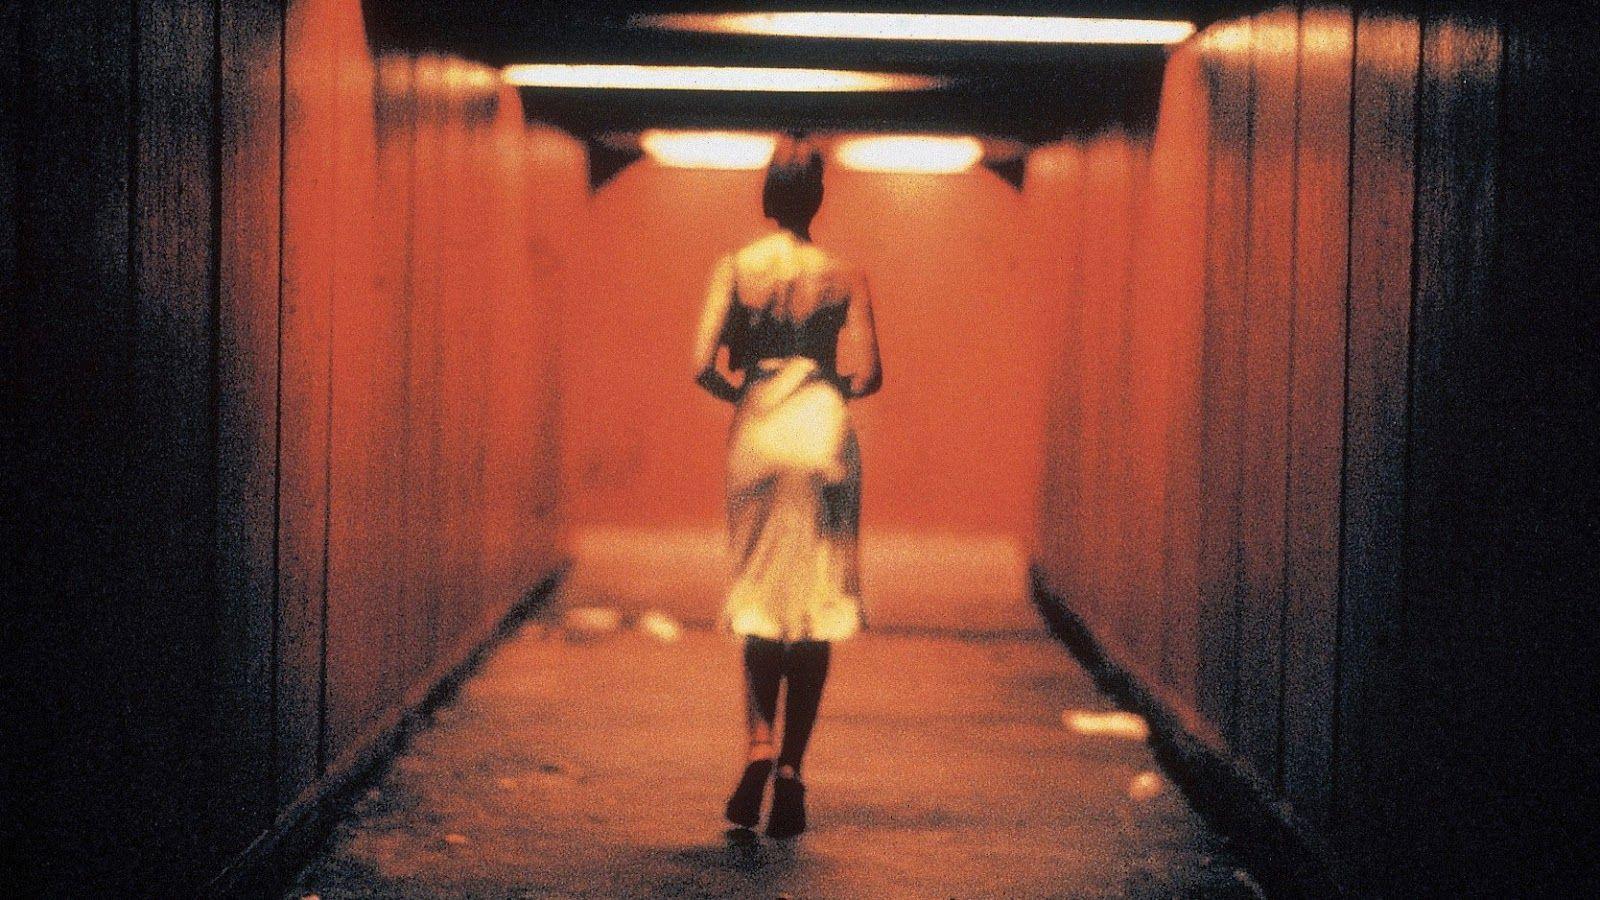 Irréversible 2002 high on films review